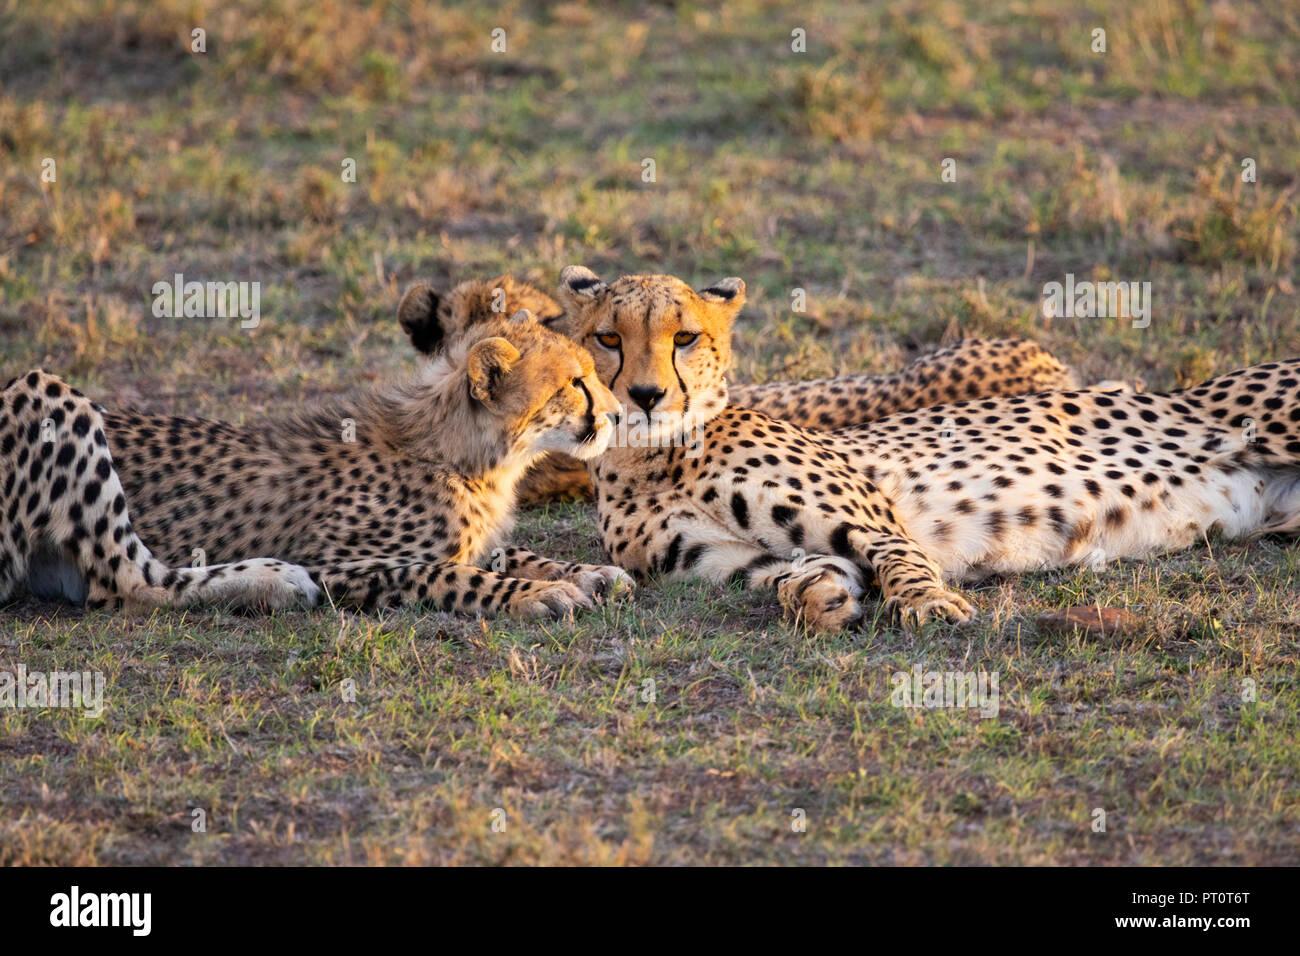 MAASAI MARA NATIONAL RESERVE, KENYA, AFRICA: Cheetah and cubs lying down on the savannah in evening sunlight at the Naboisho Cons Stock Photo